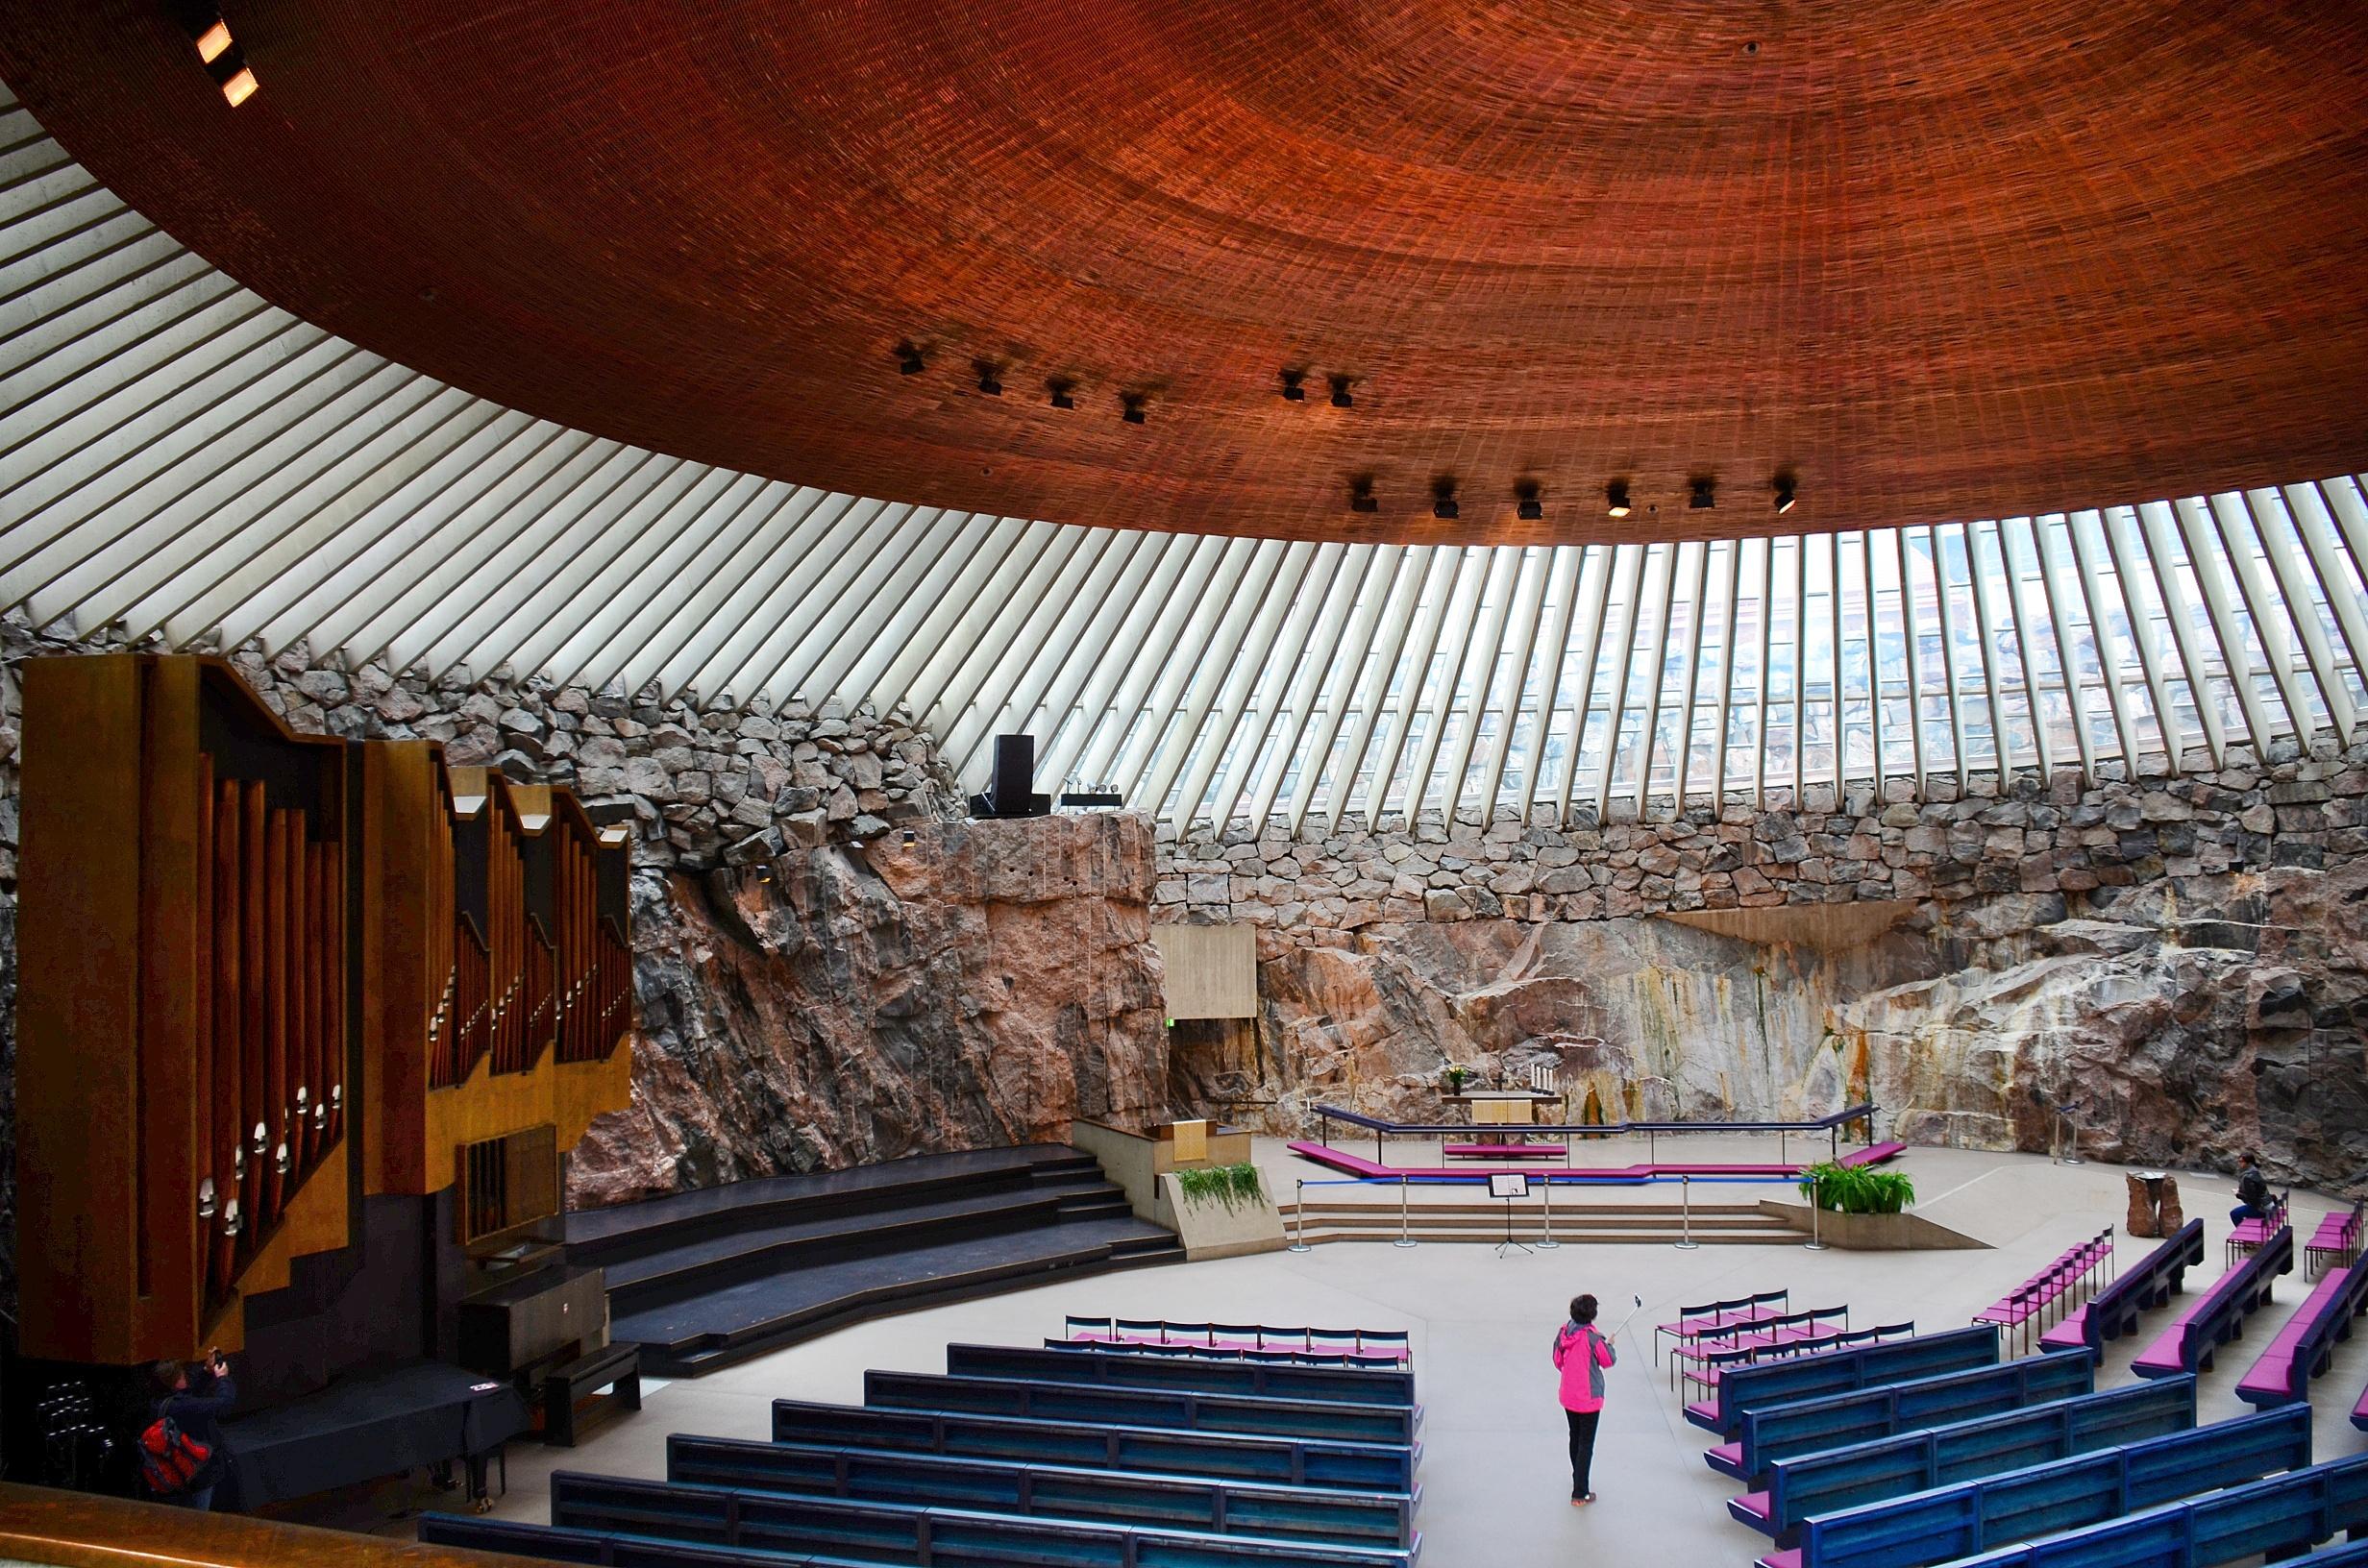 Temppeliaukio Church-Helsinki Travel